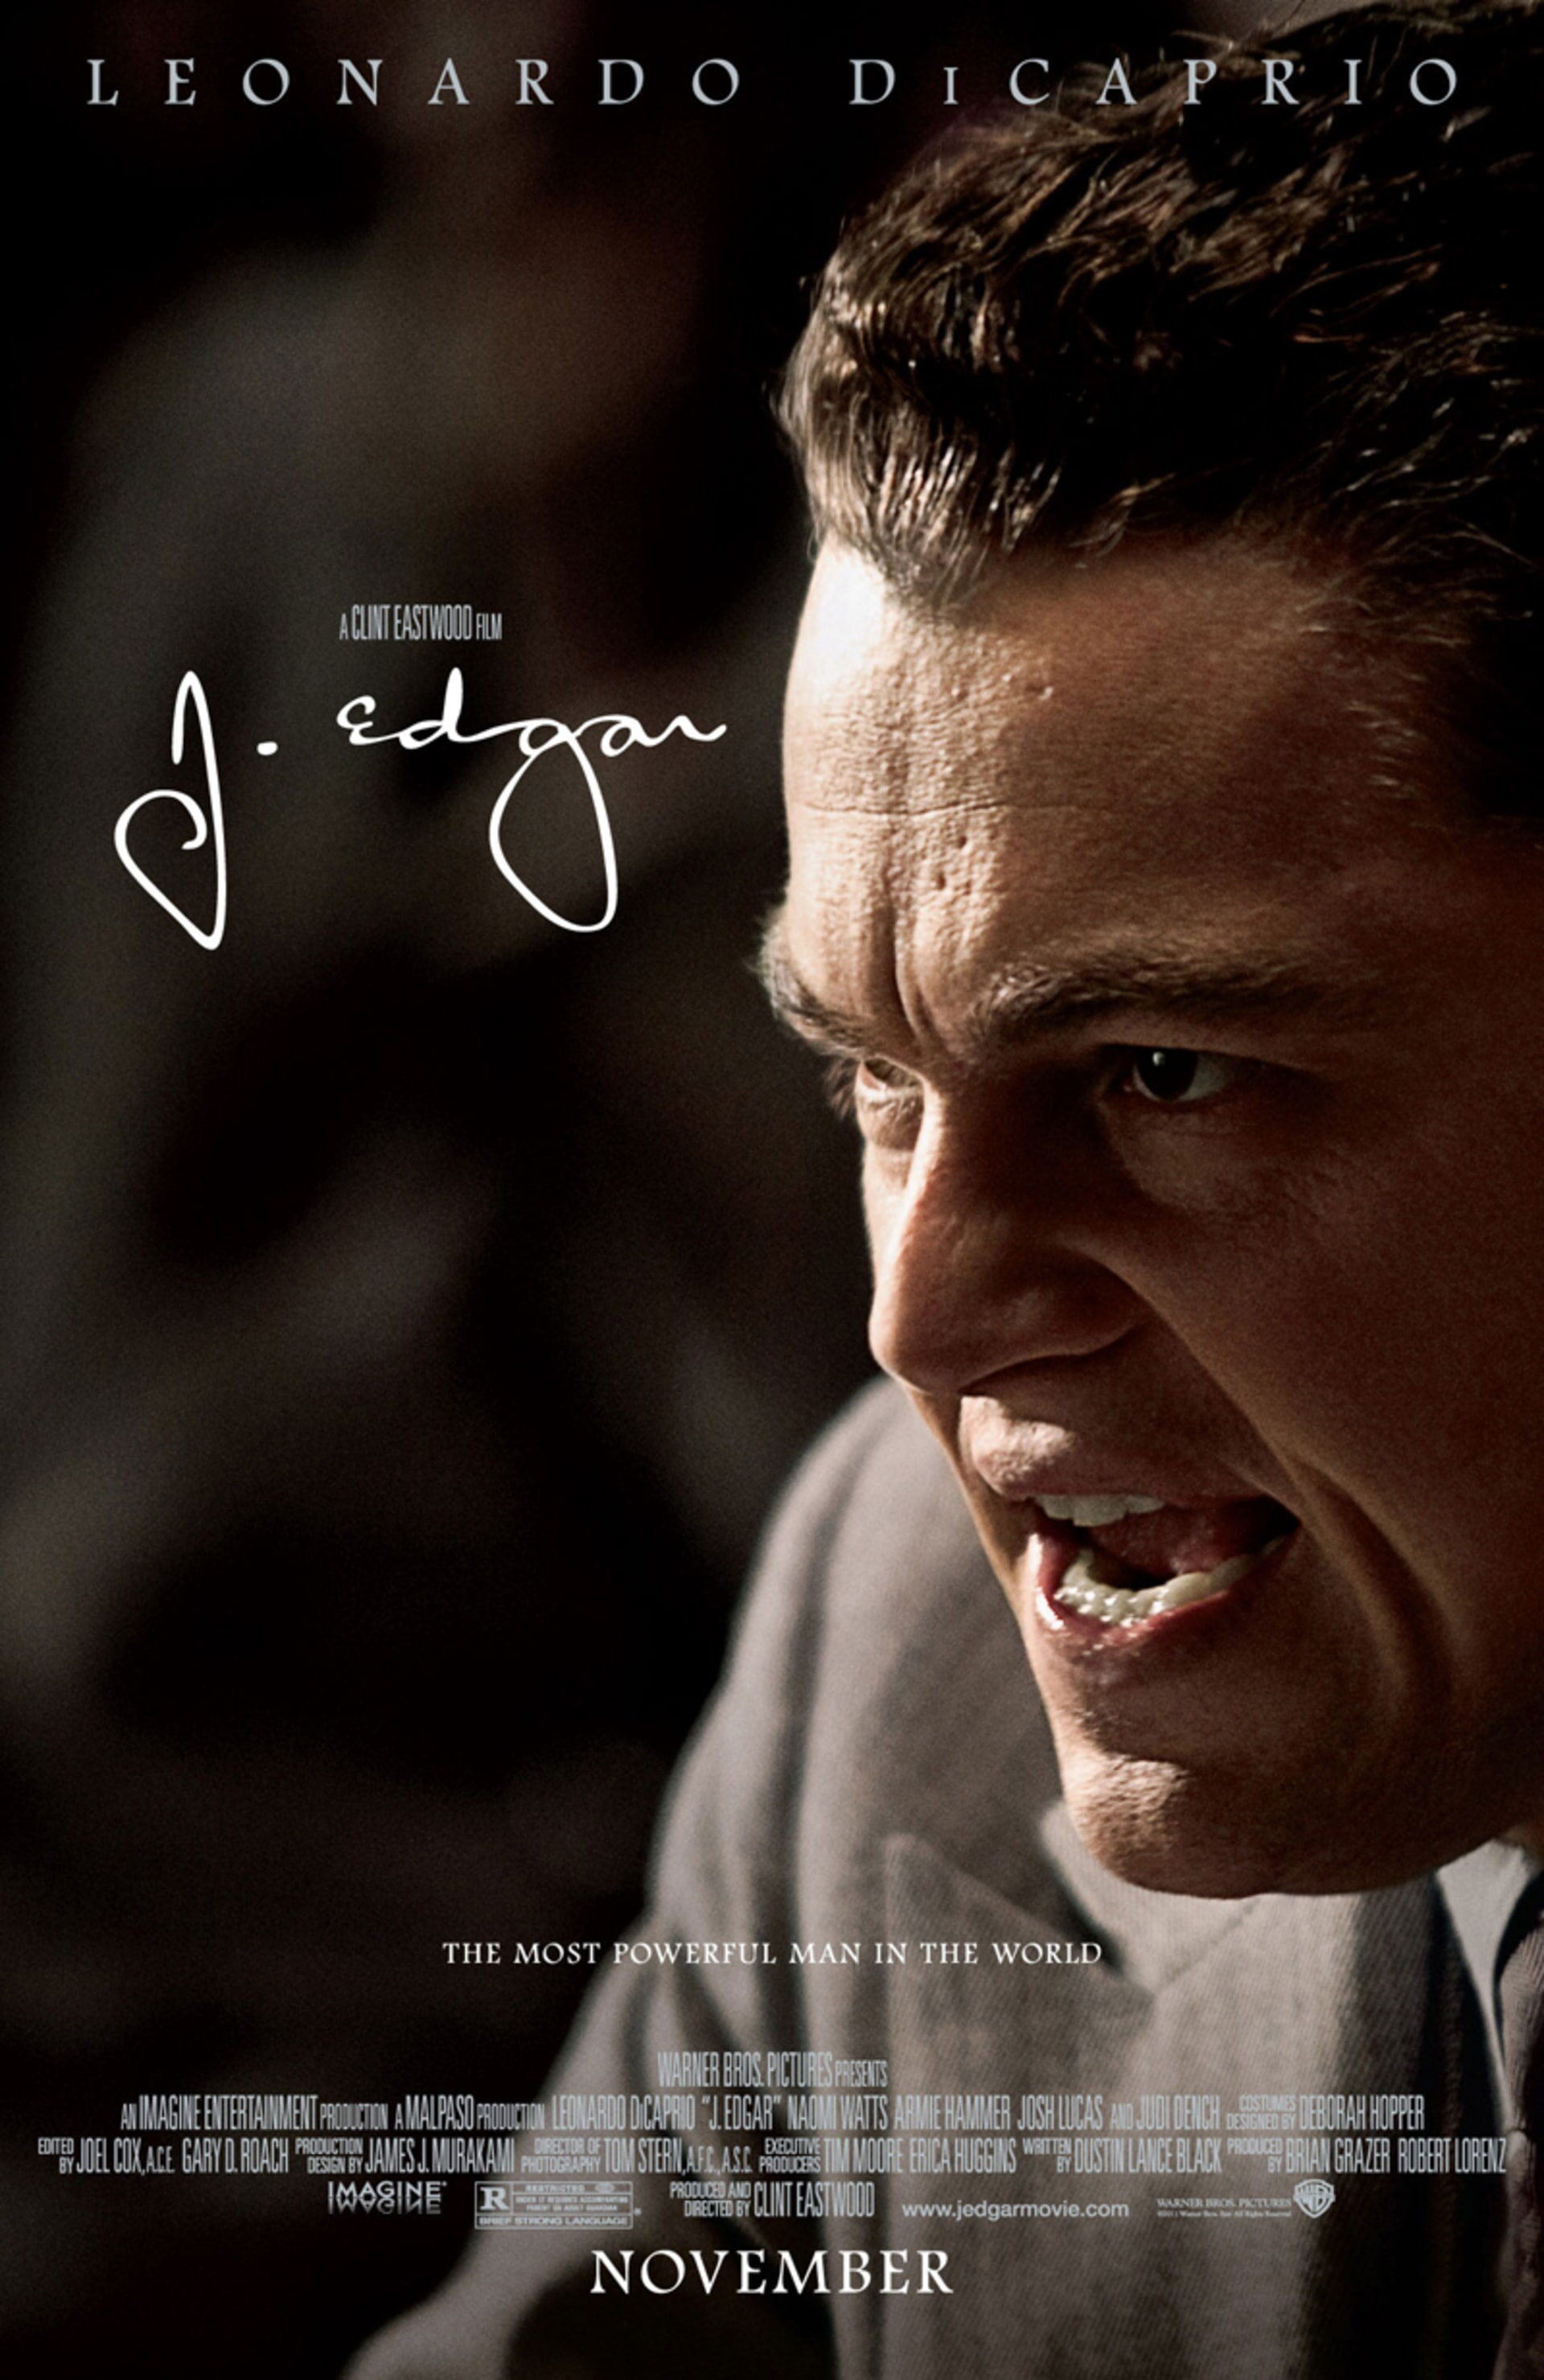 J. Edgar - Poster 1